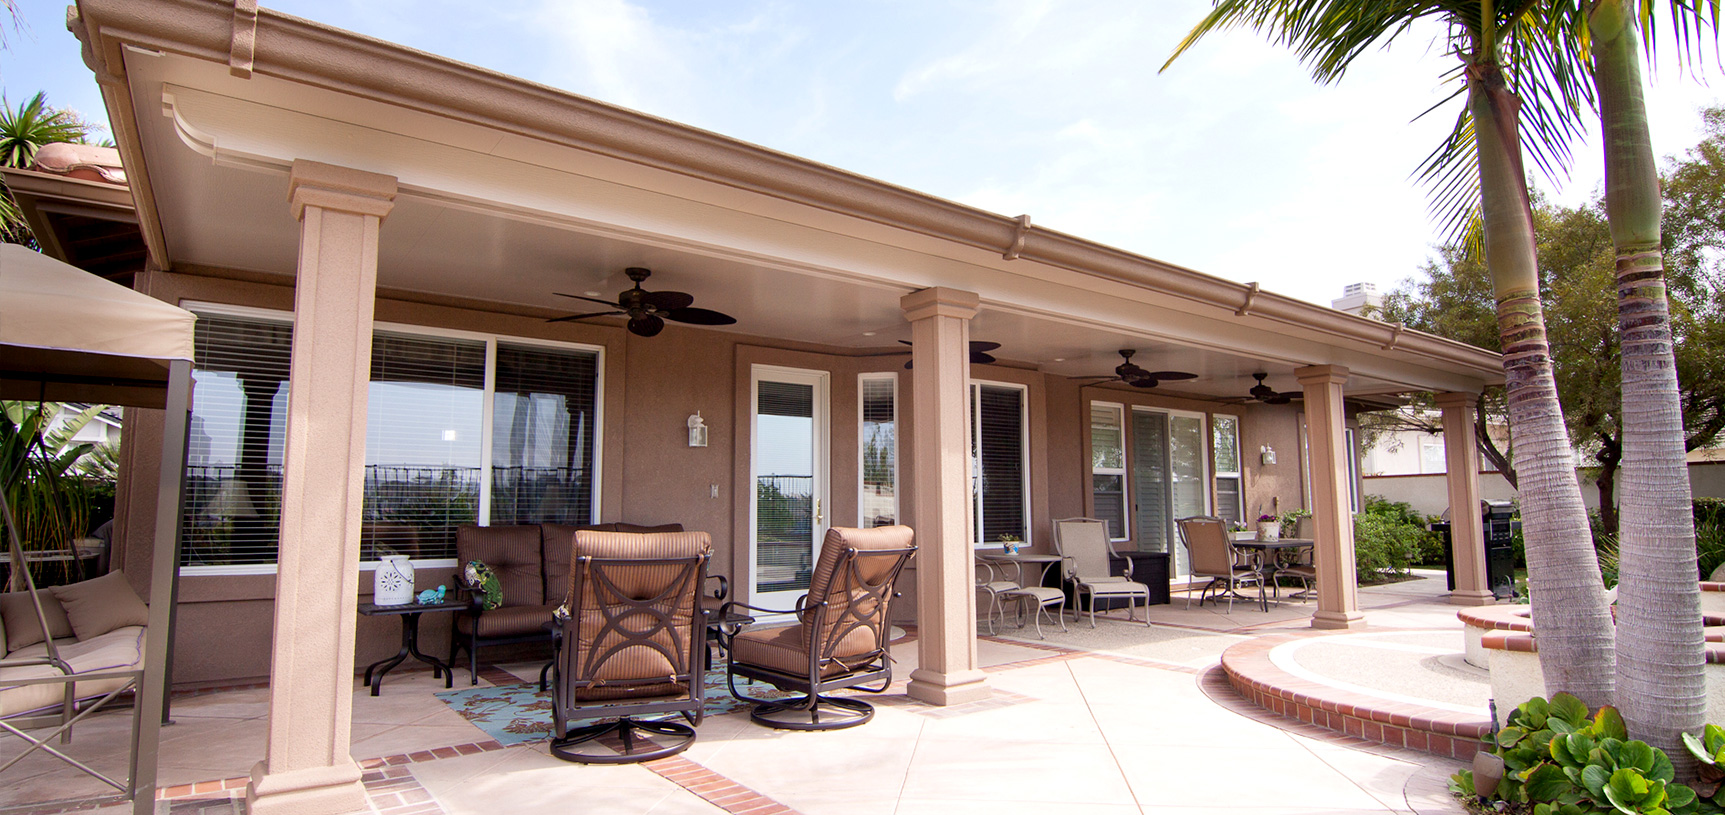 elitewood patio cover cost effective